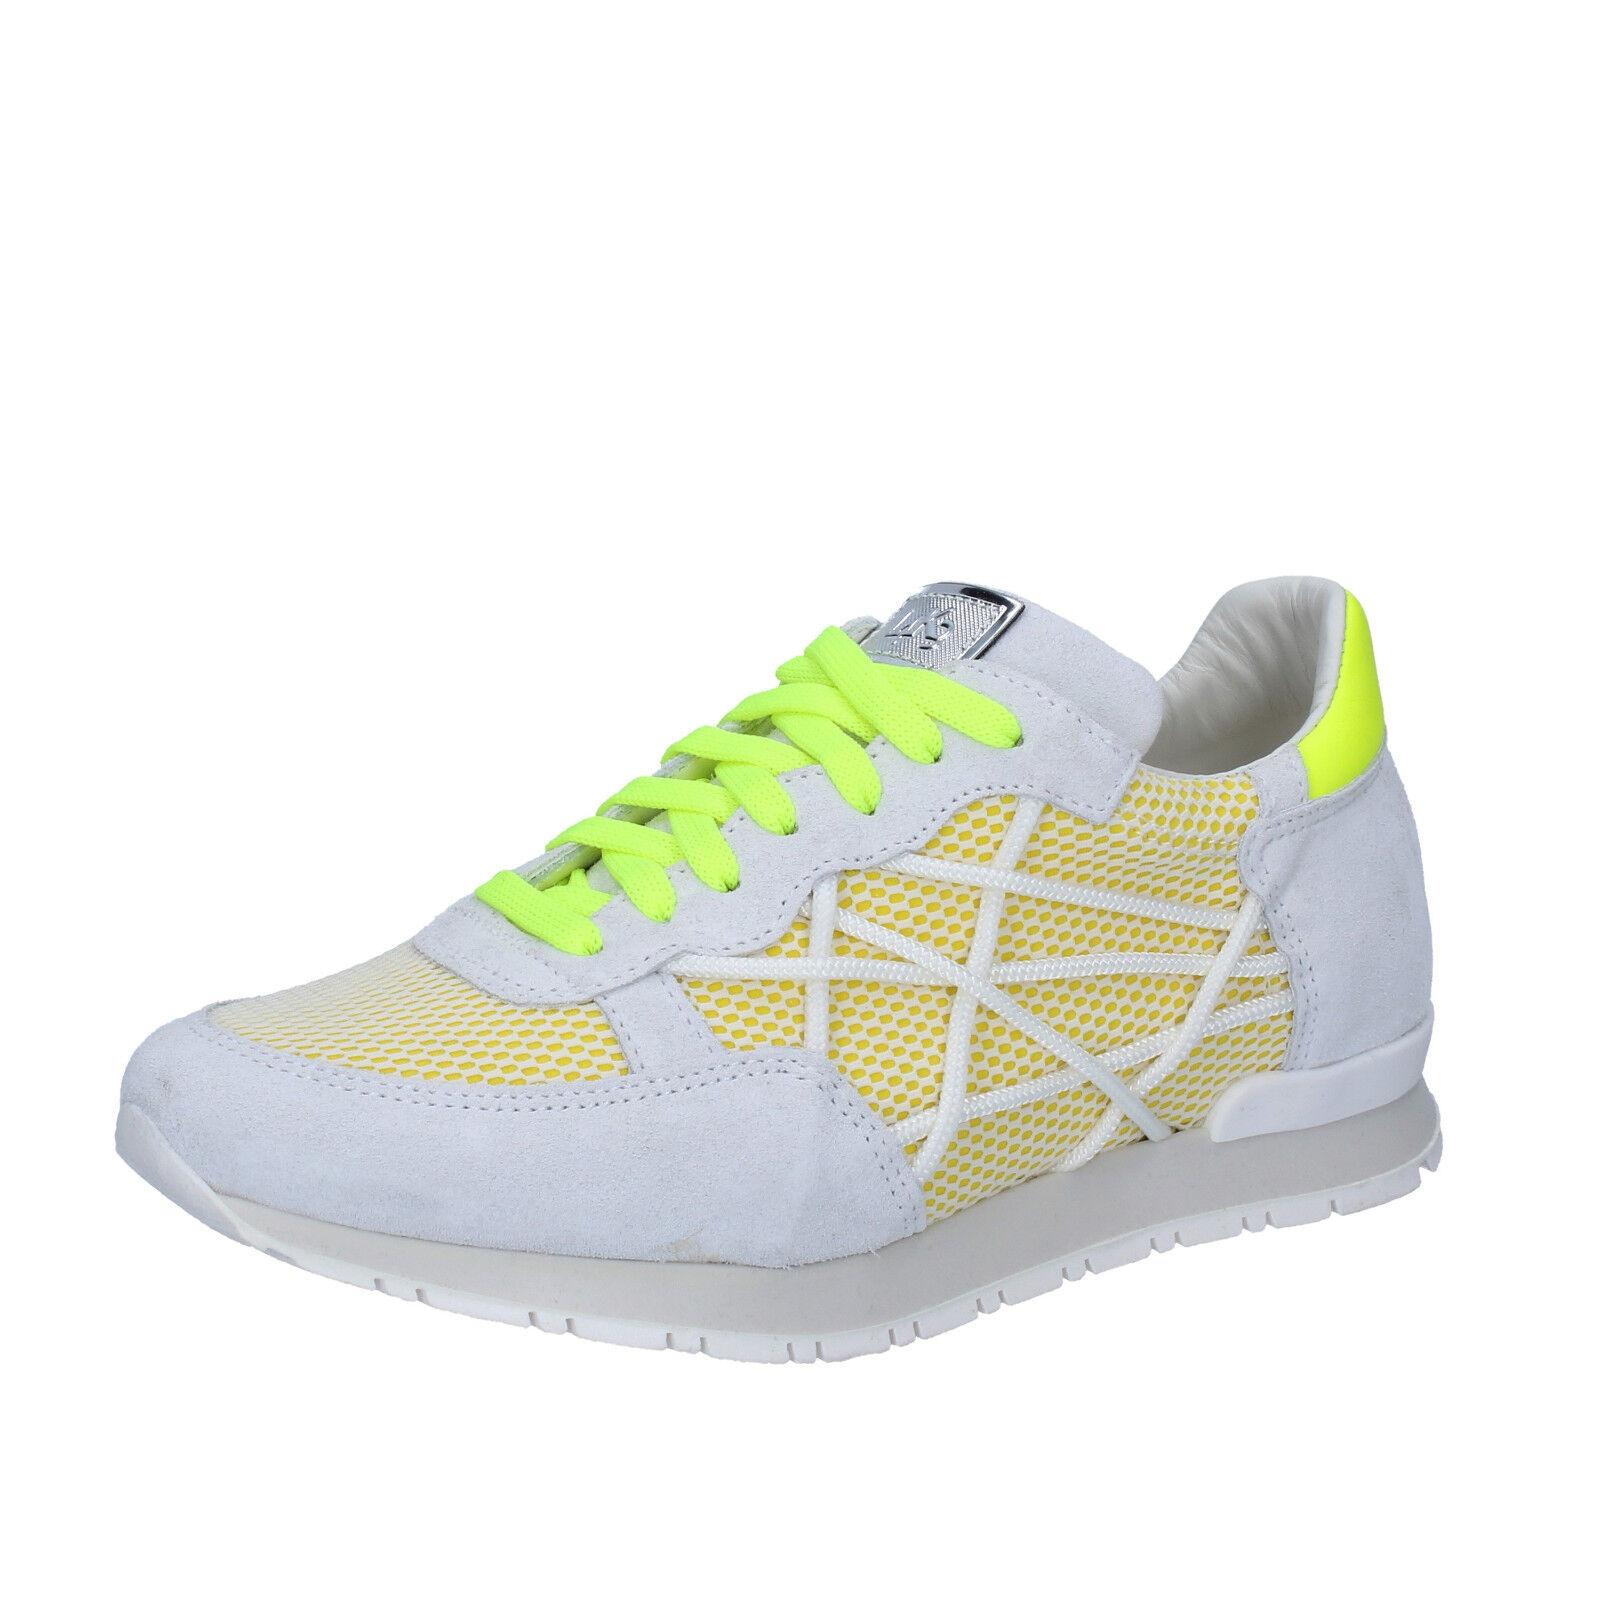 Scarpe donna L4K3 36 scarpe da ginnastica bianco giallo tessuto camoscio BZ447-B